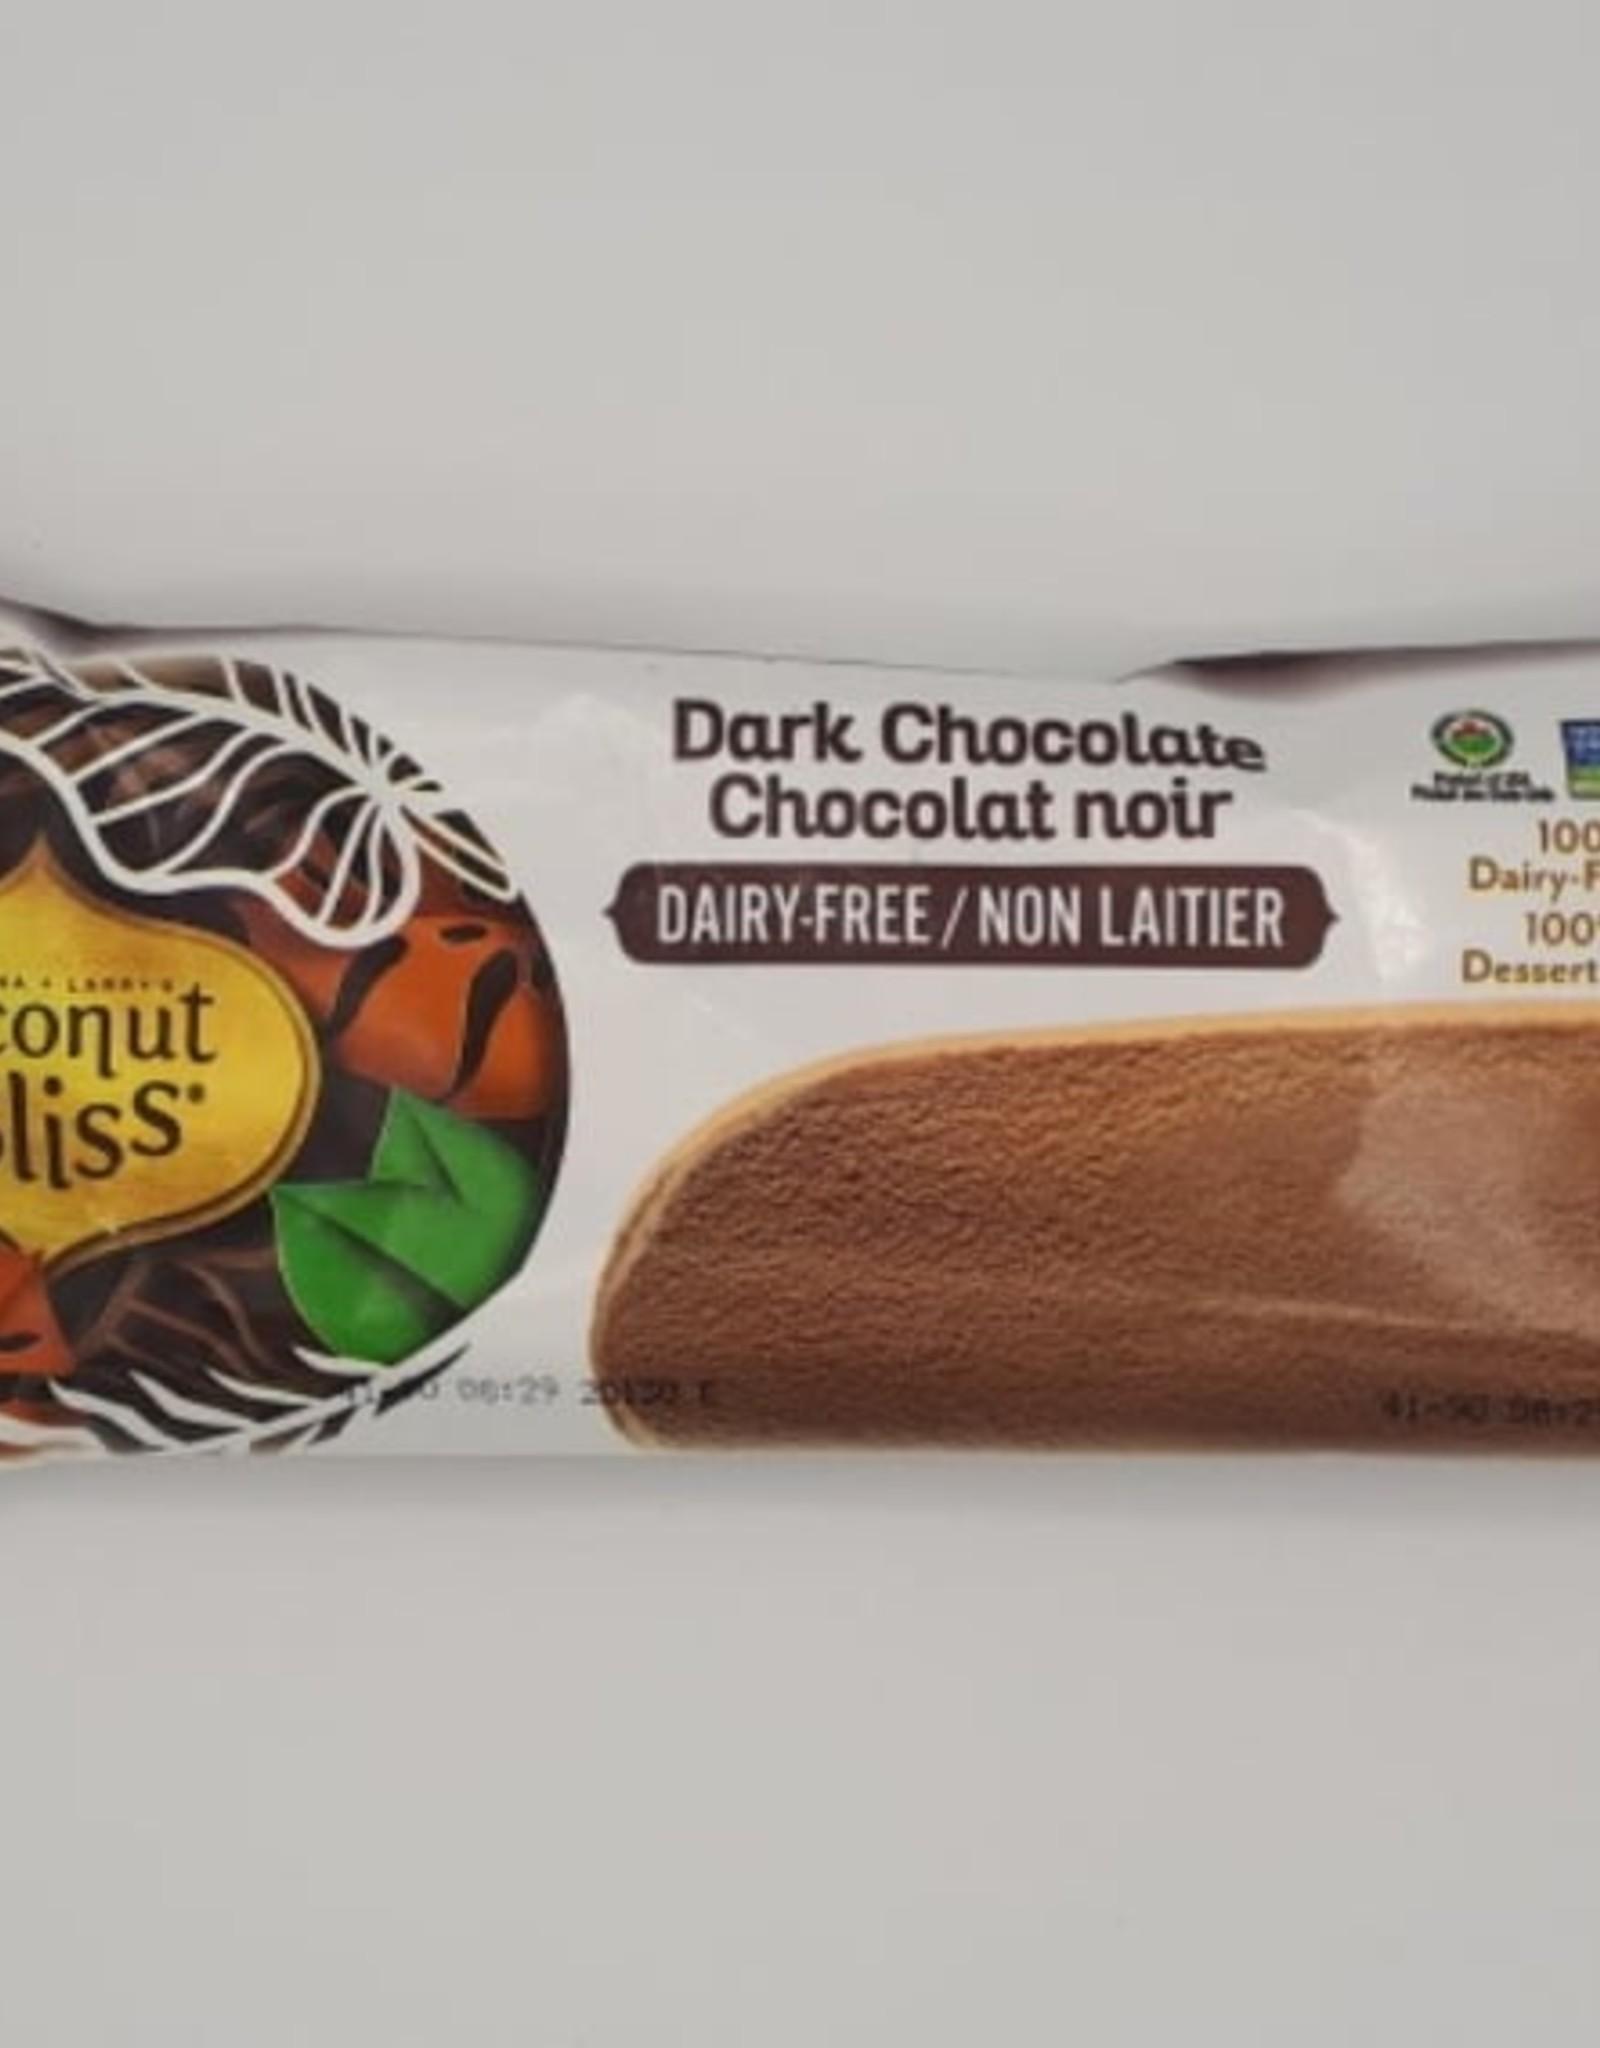 Coconut Bliss Coconut Bliss - Barre Glacée, Chocolat Noir (89ml)